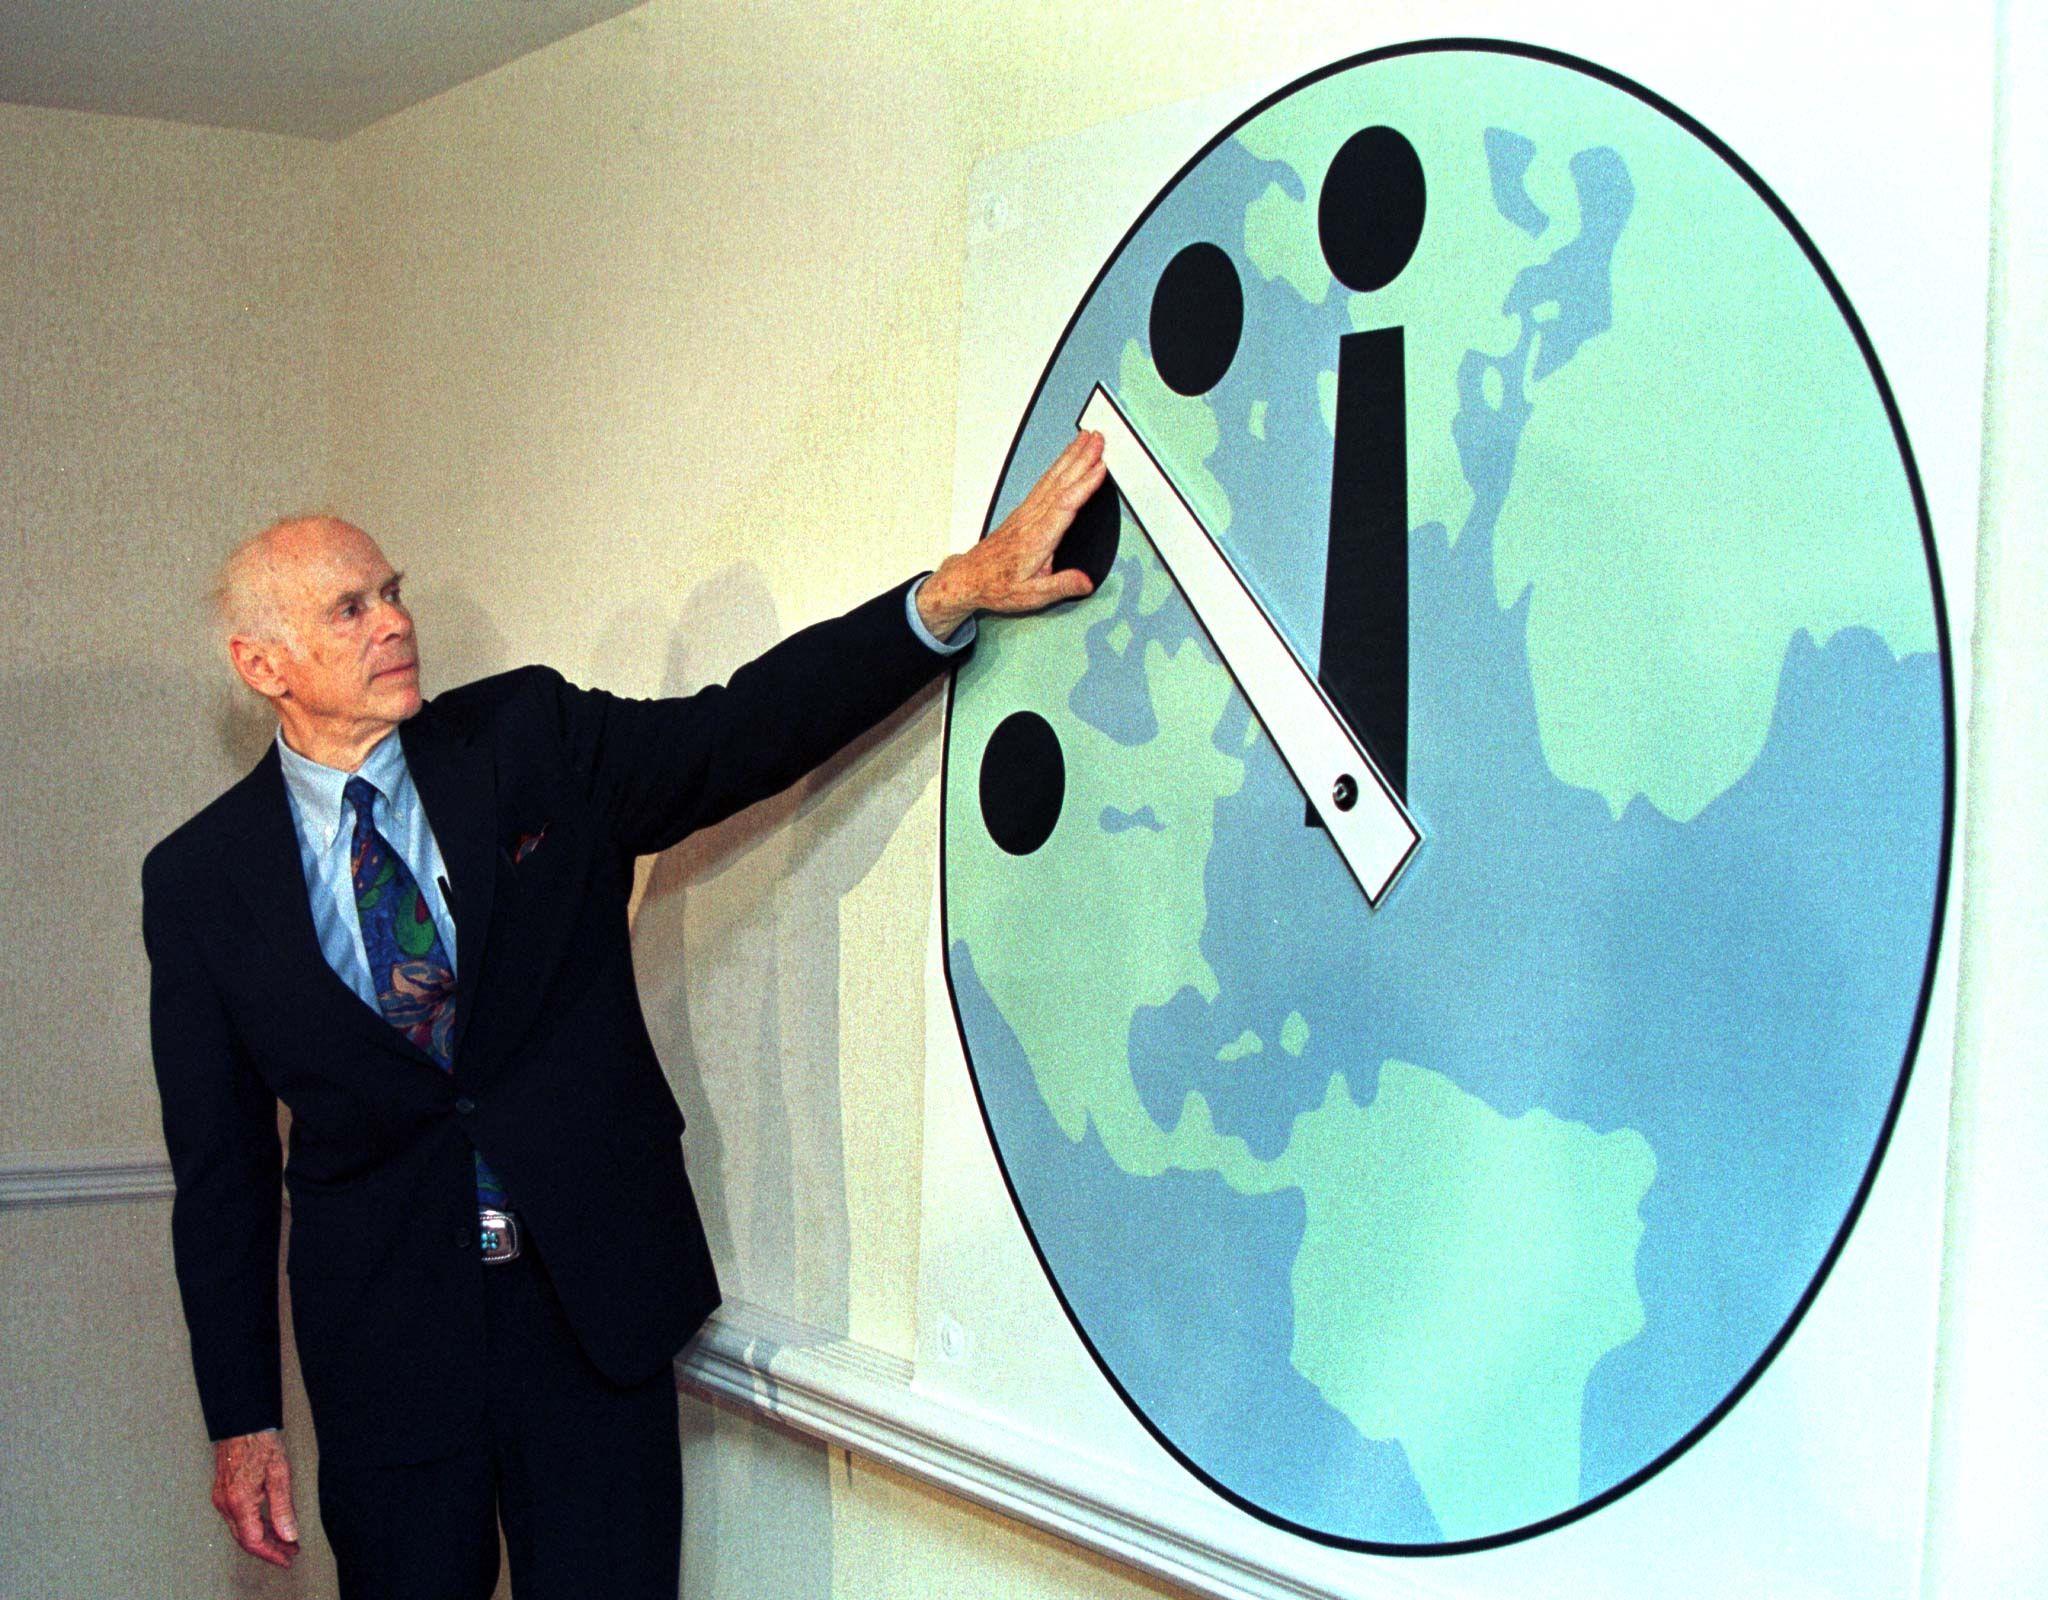 doomsday clock - photo #23